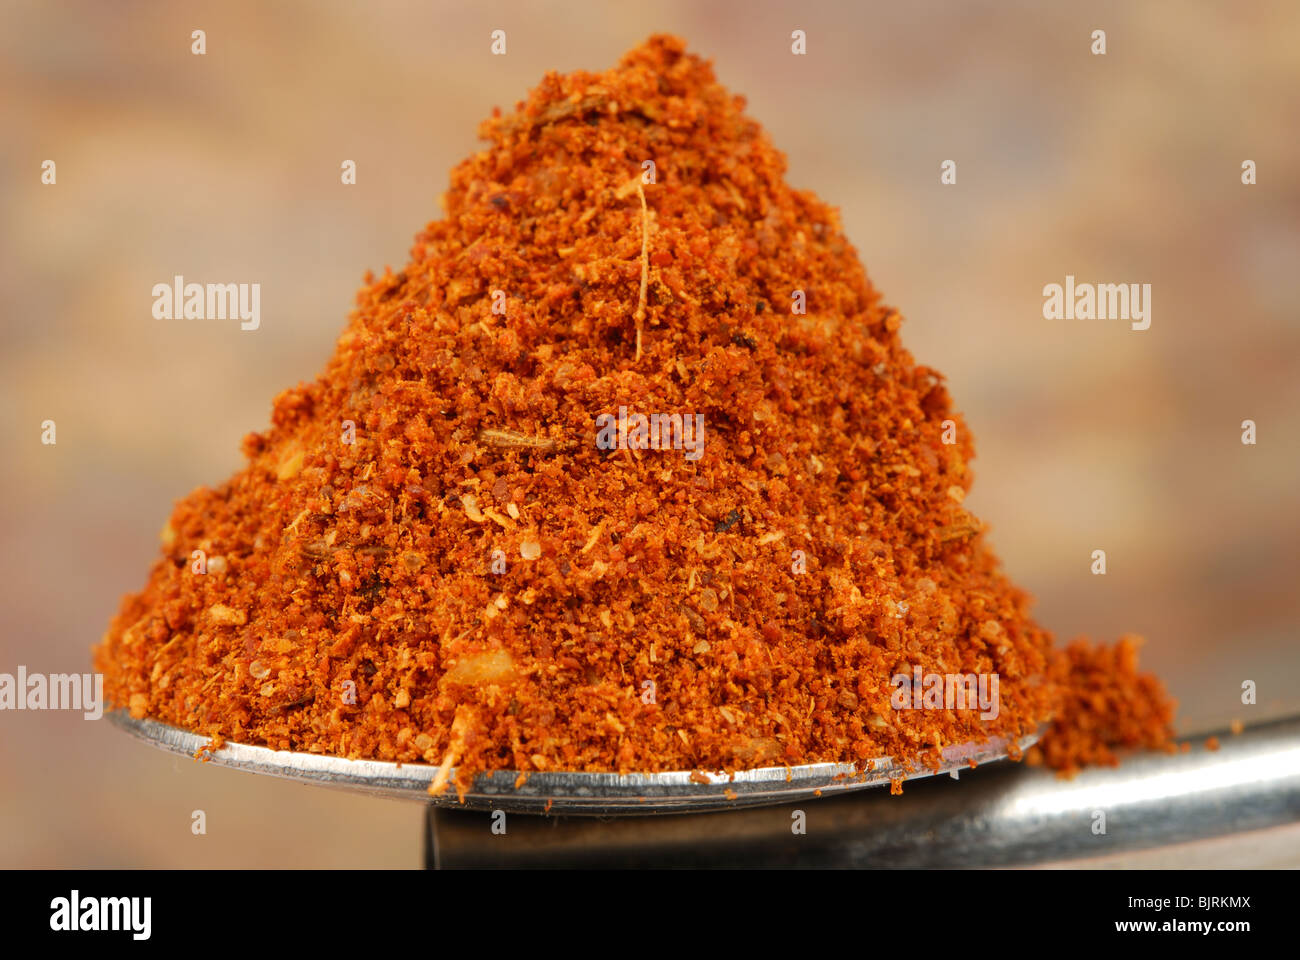 Roasted tandoori spice powder (coriander seed, cumin, garlic, chilli, ginger, salt, cardamom, bay, star anise, cinnamon) - Stock Image